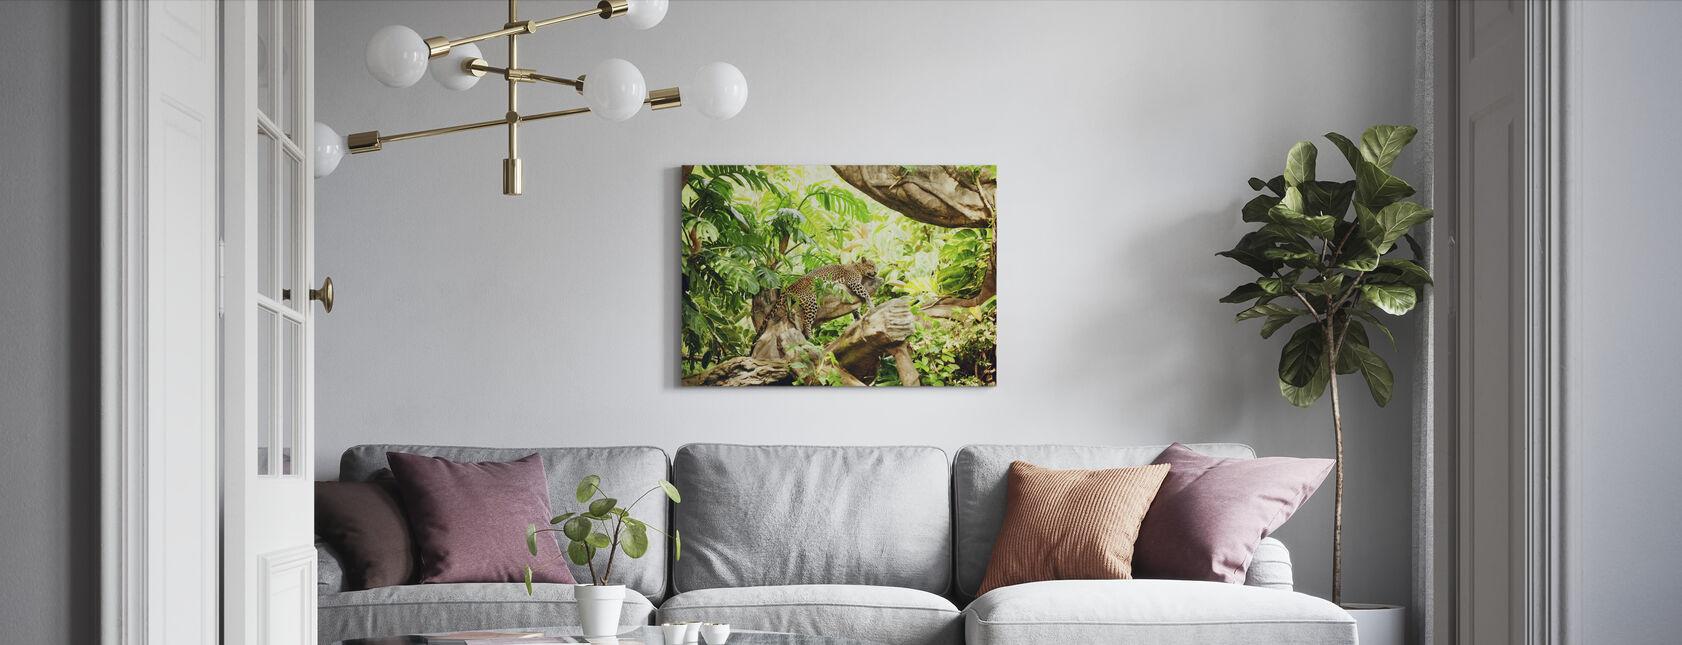 Luipaard dommelen in de jungle - Canvas print - Woonkamer